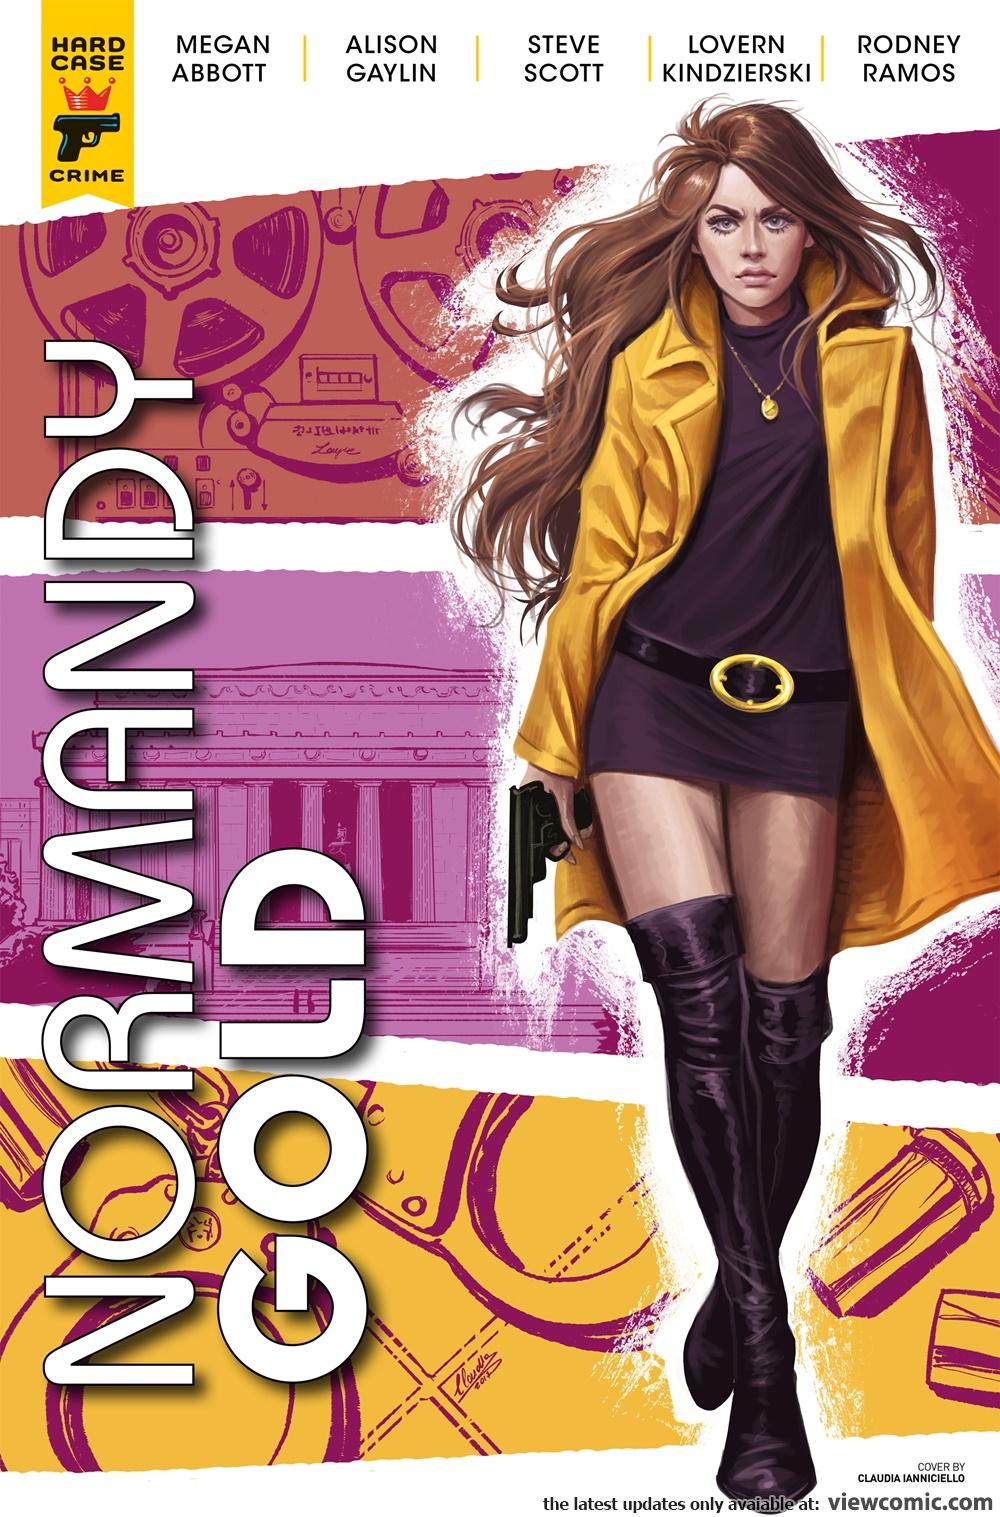 Normandy Gold 003 (2017)  | Vietcomic.net reading comics online for free